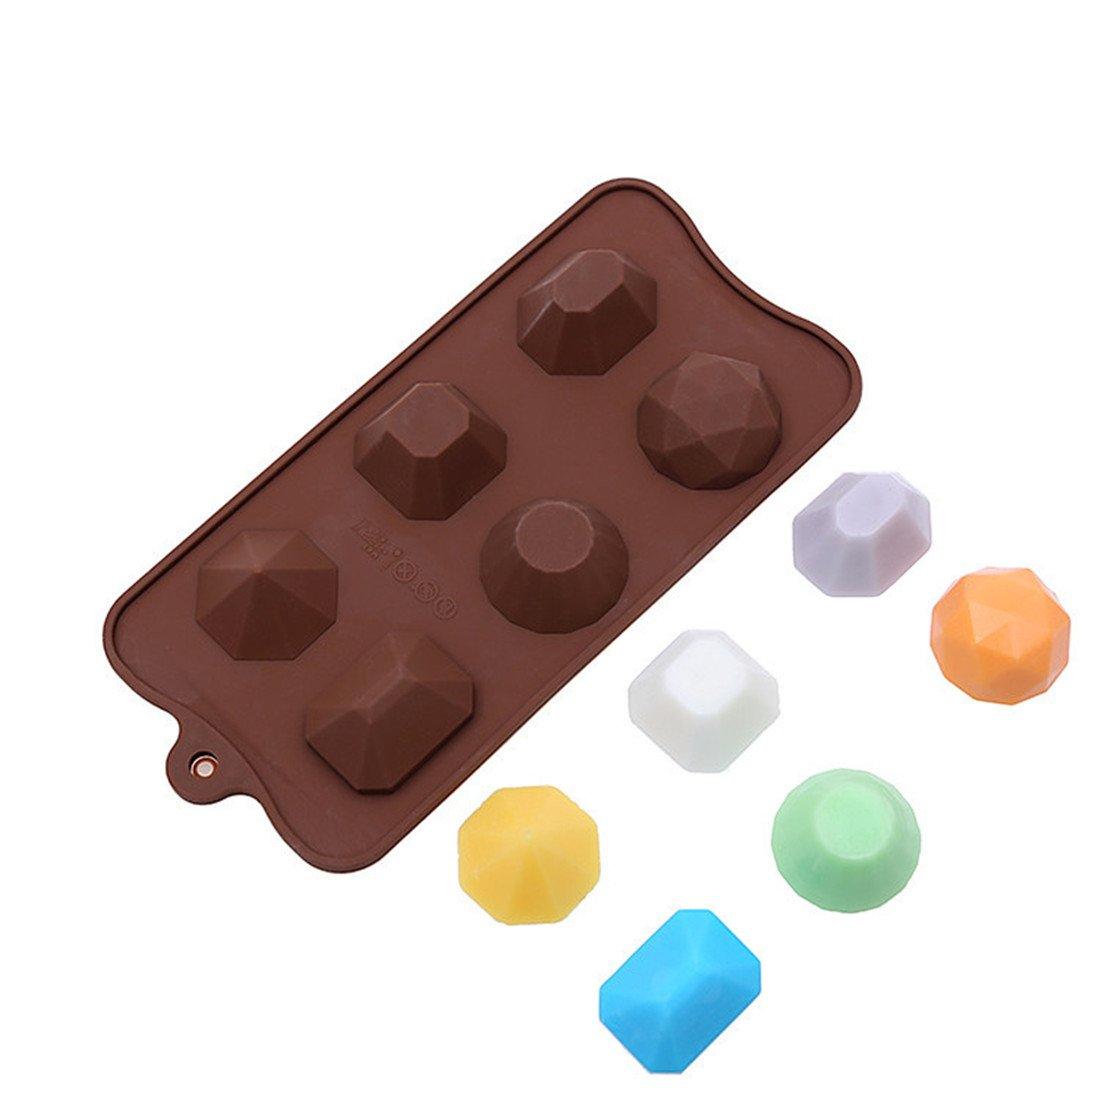 Amazon.com: Yunko 3d Gem Diamond Cool Ice Cube Chocolate Soap Tray ...